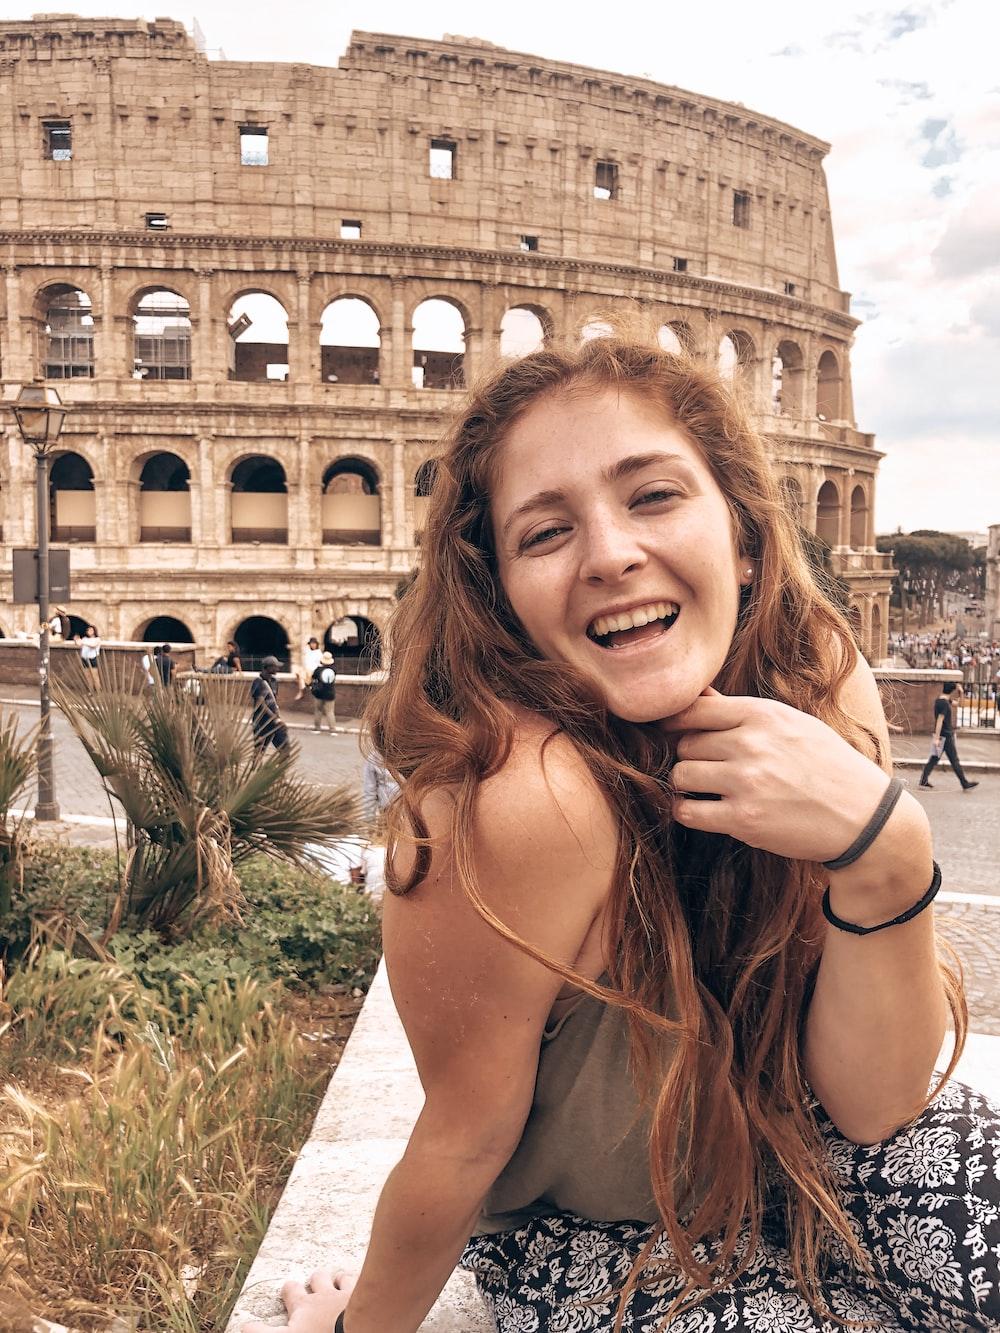 woman smiling near coliseum